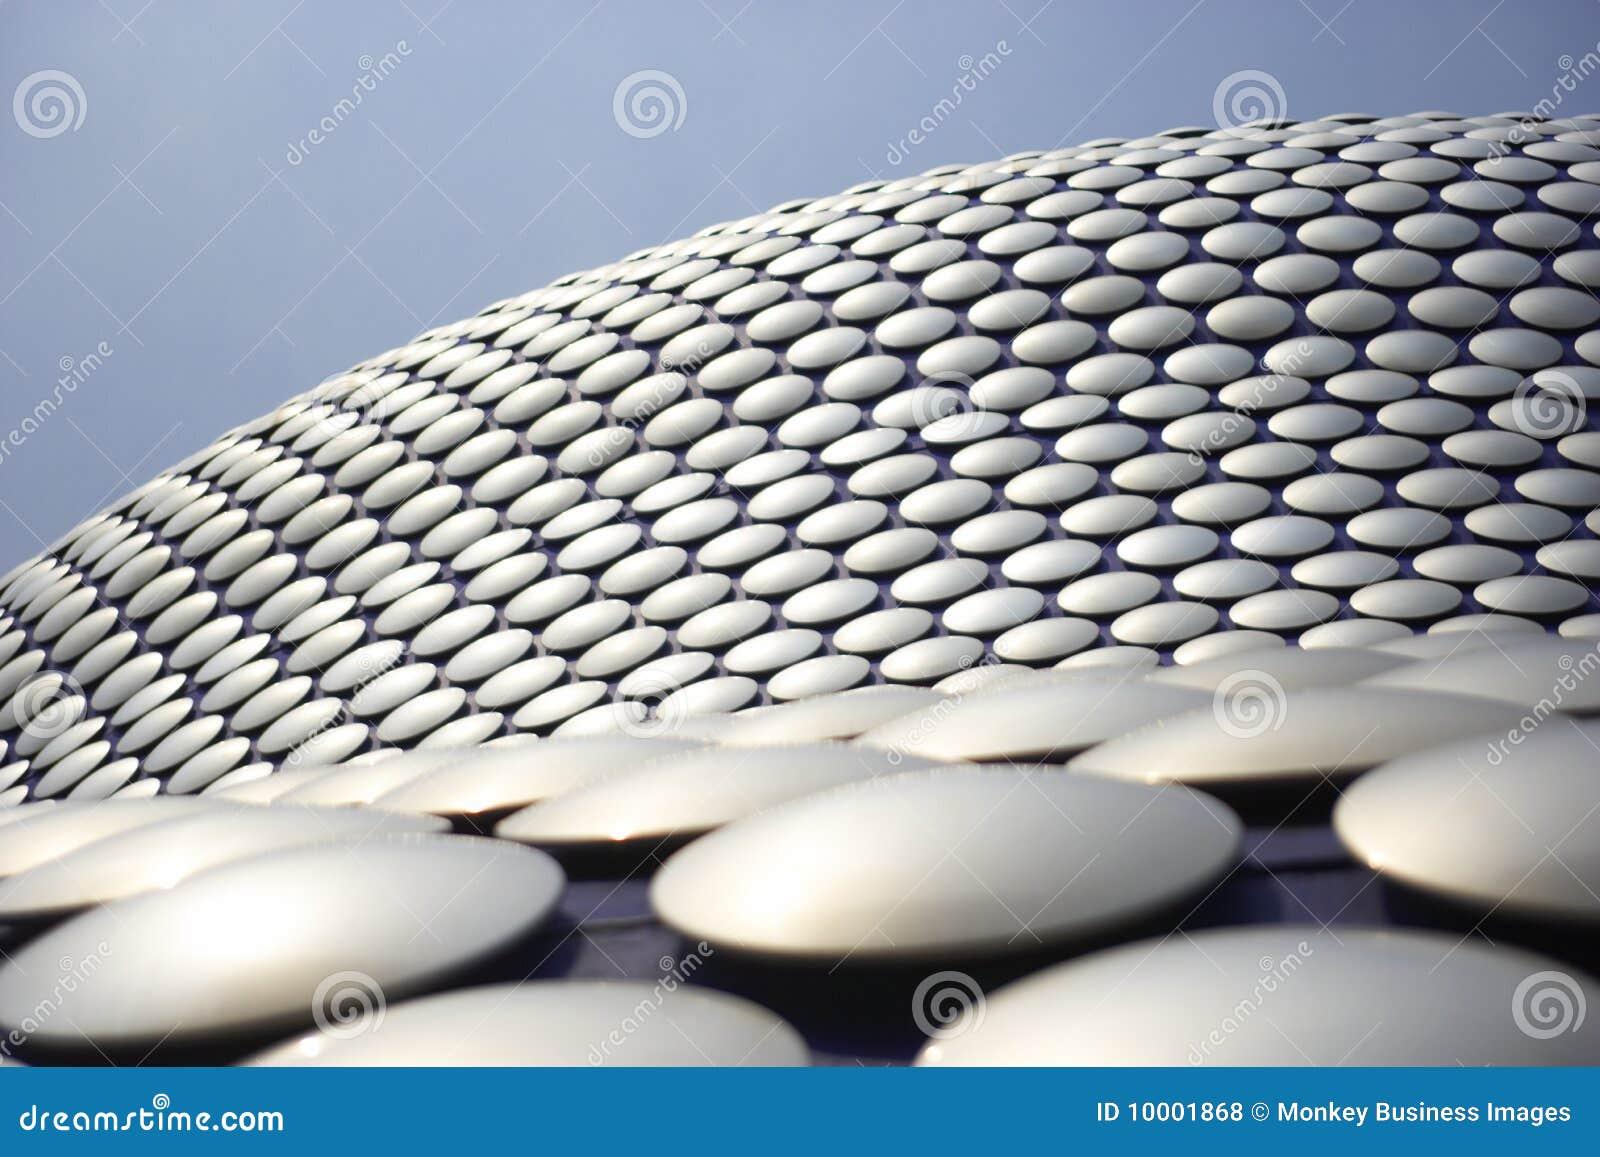 The Bullring Shopping Centre,Birmingham,UK